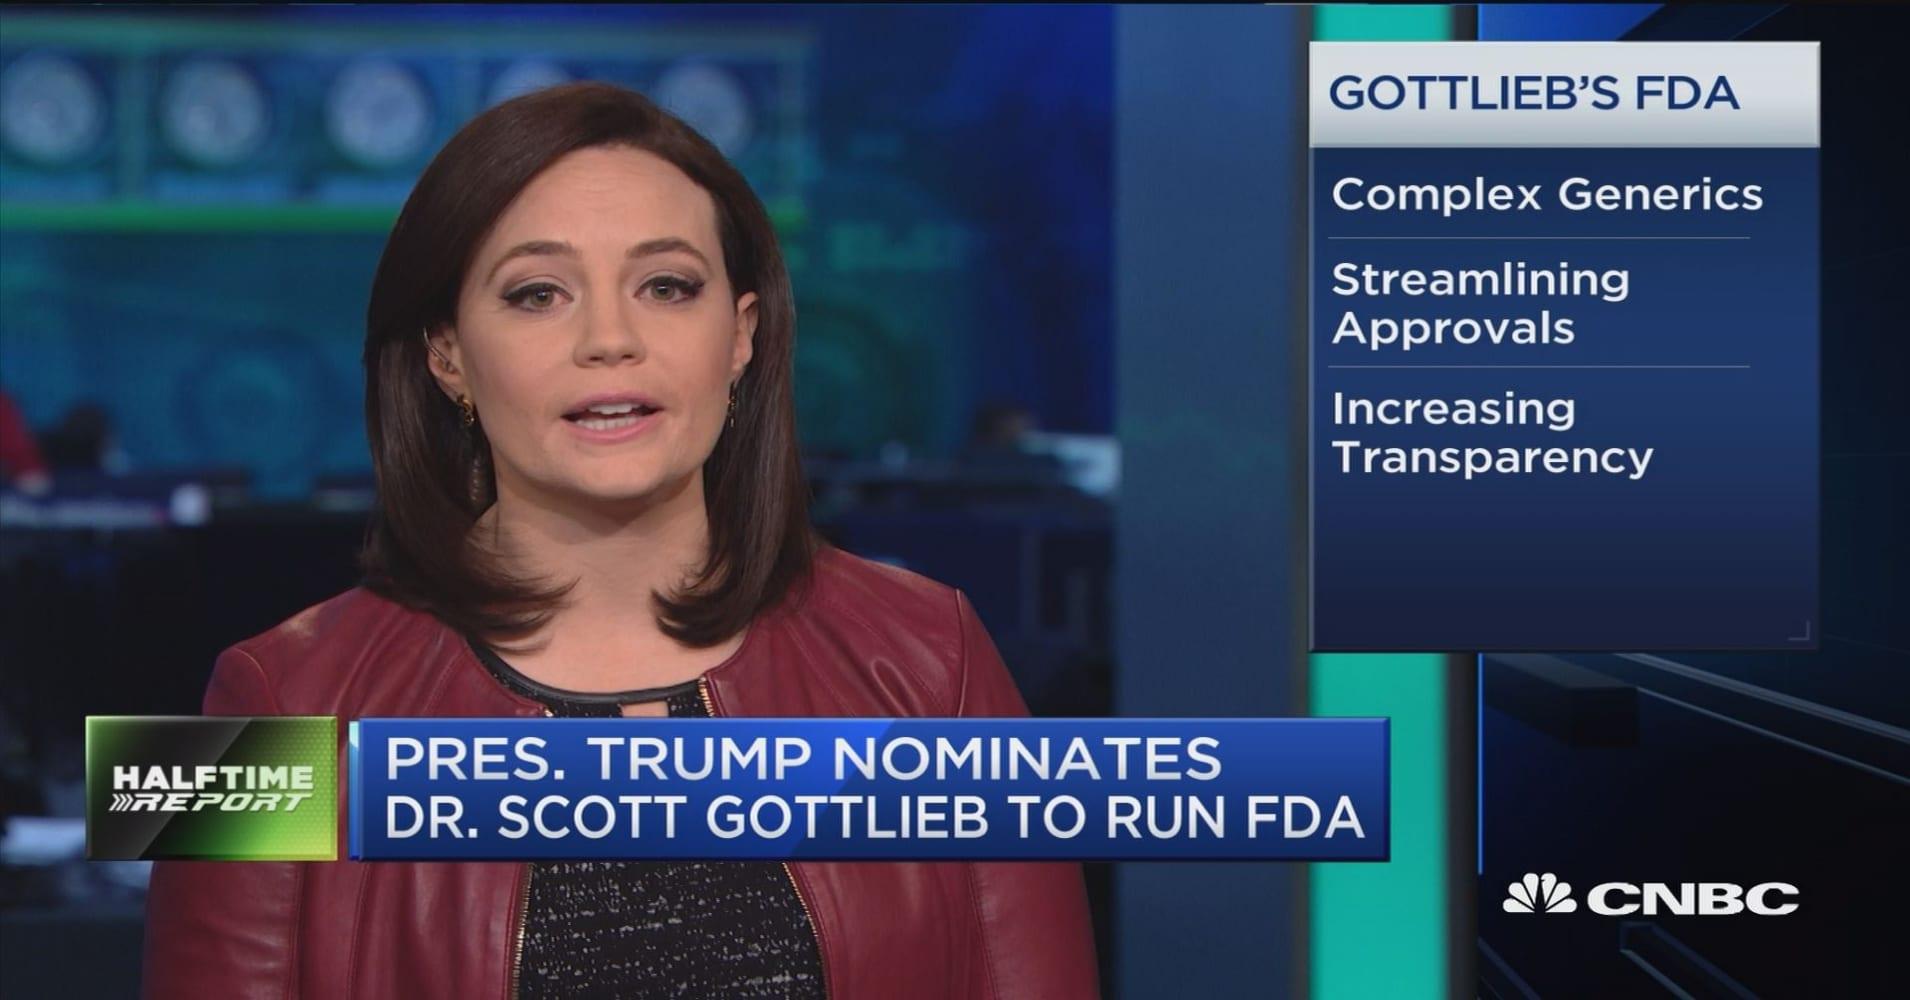 pres trump nominates dr scott gottlieb to run fda trump nominates dr scott gottlieb to run fda